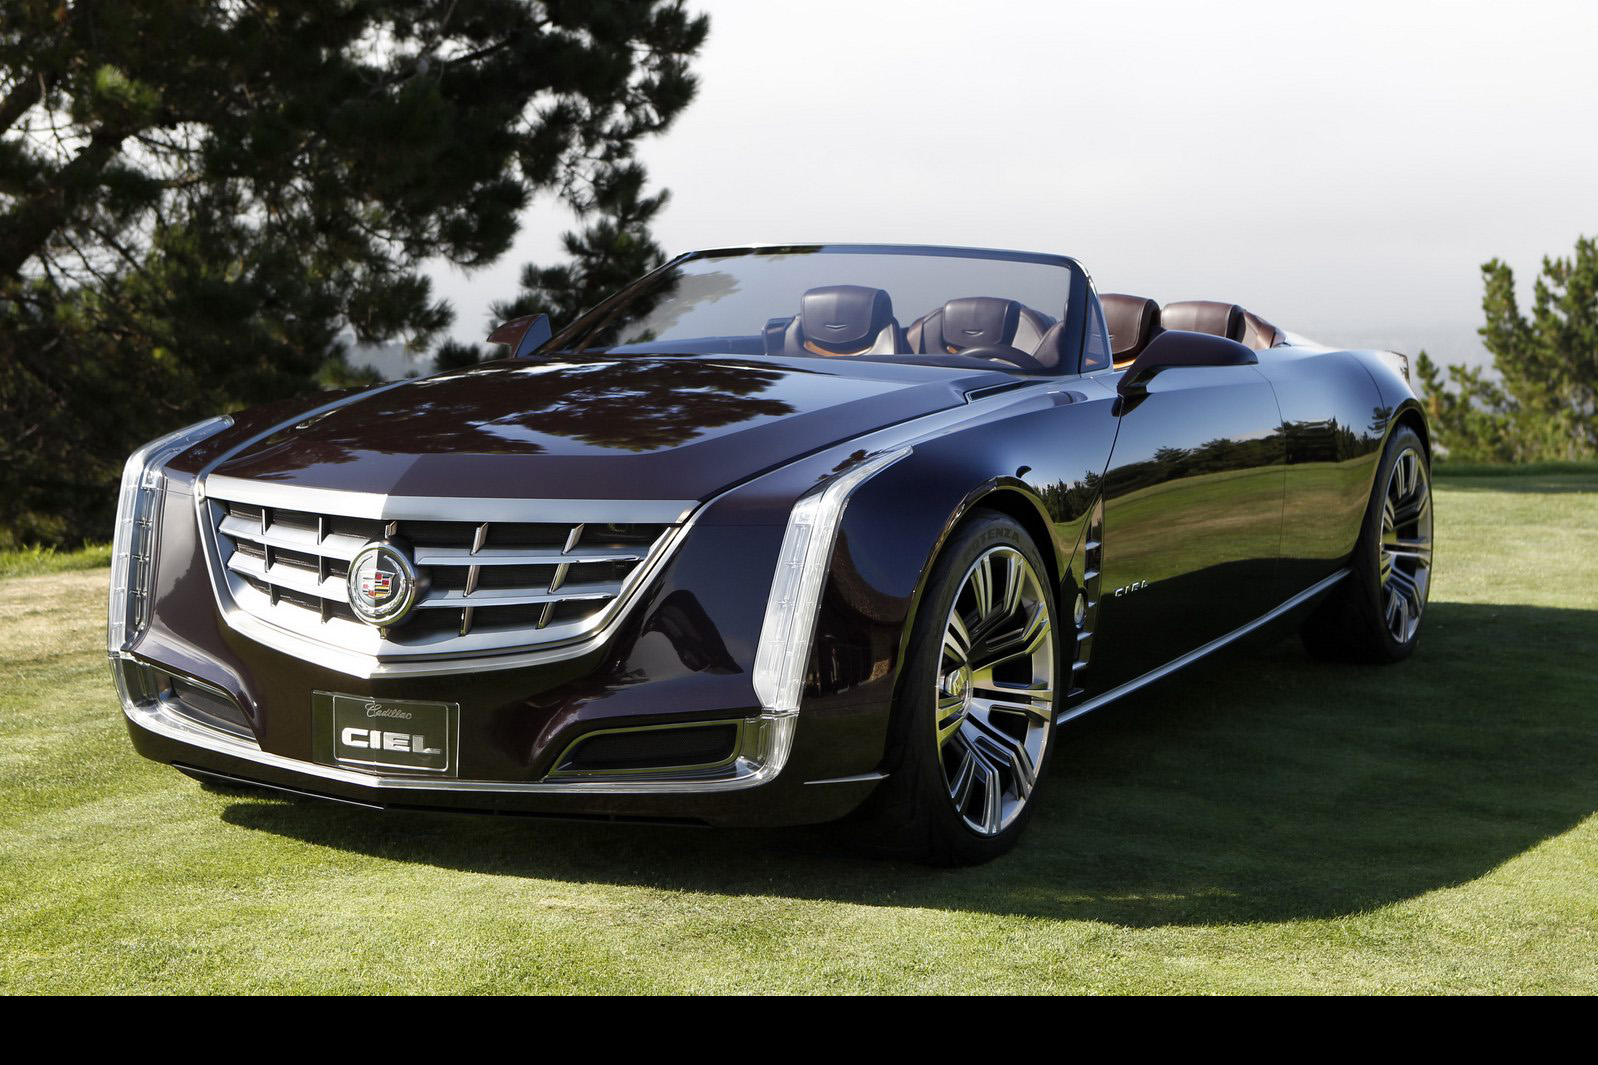 Cadillac STS 2013 foto - 3